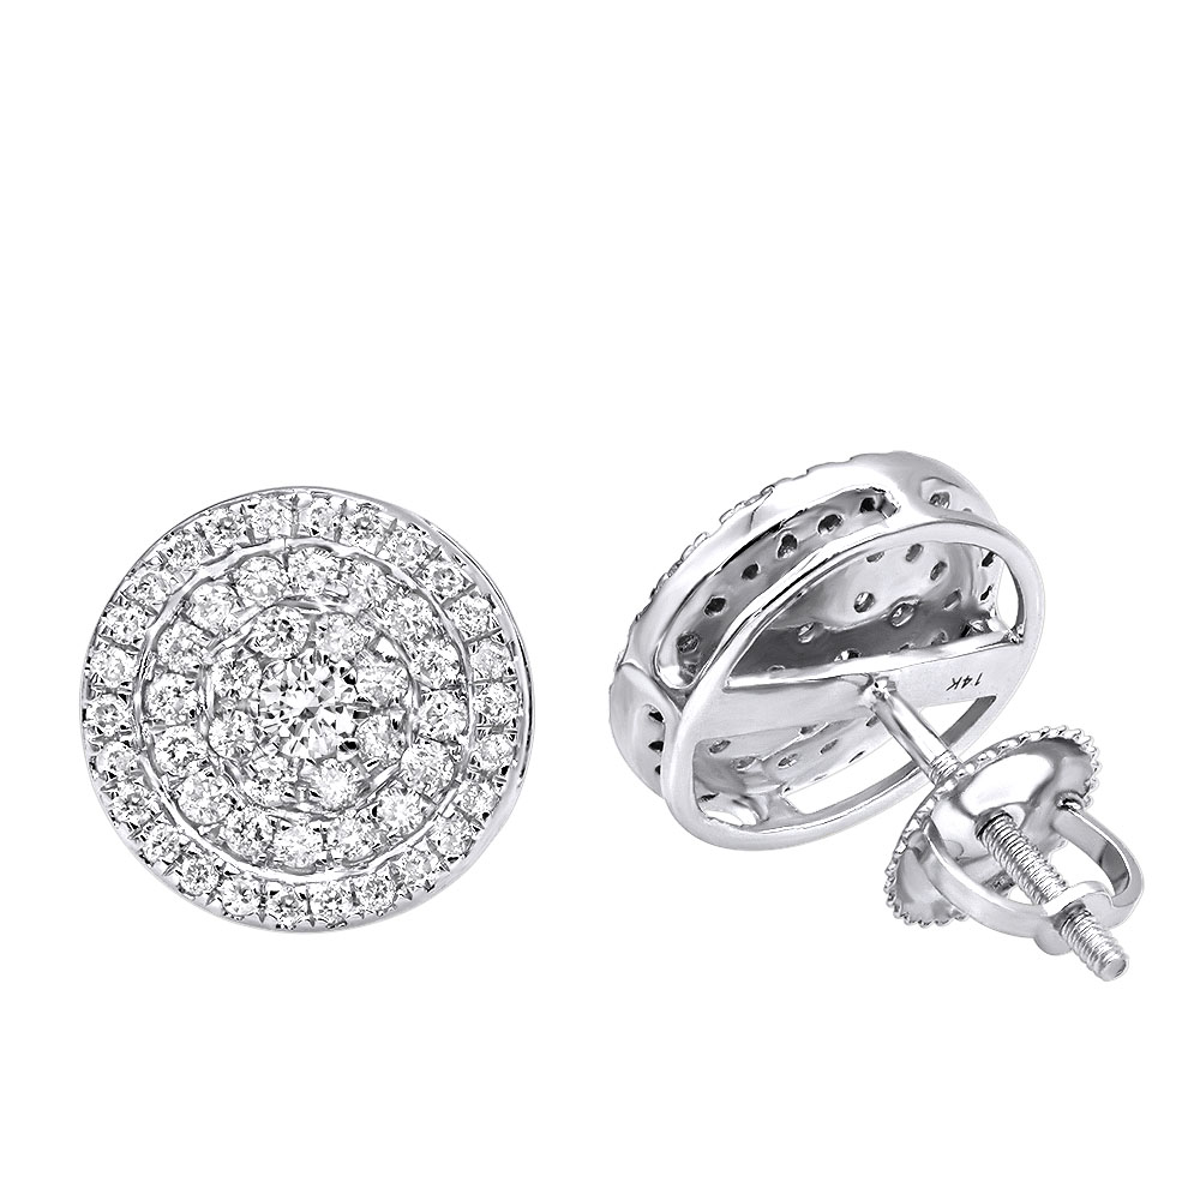 14k Gold Pave Diamond Earrings for Men & Women 3/4ct Studs Real Diamonds